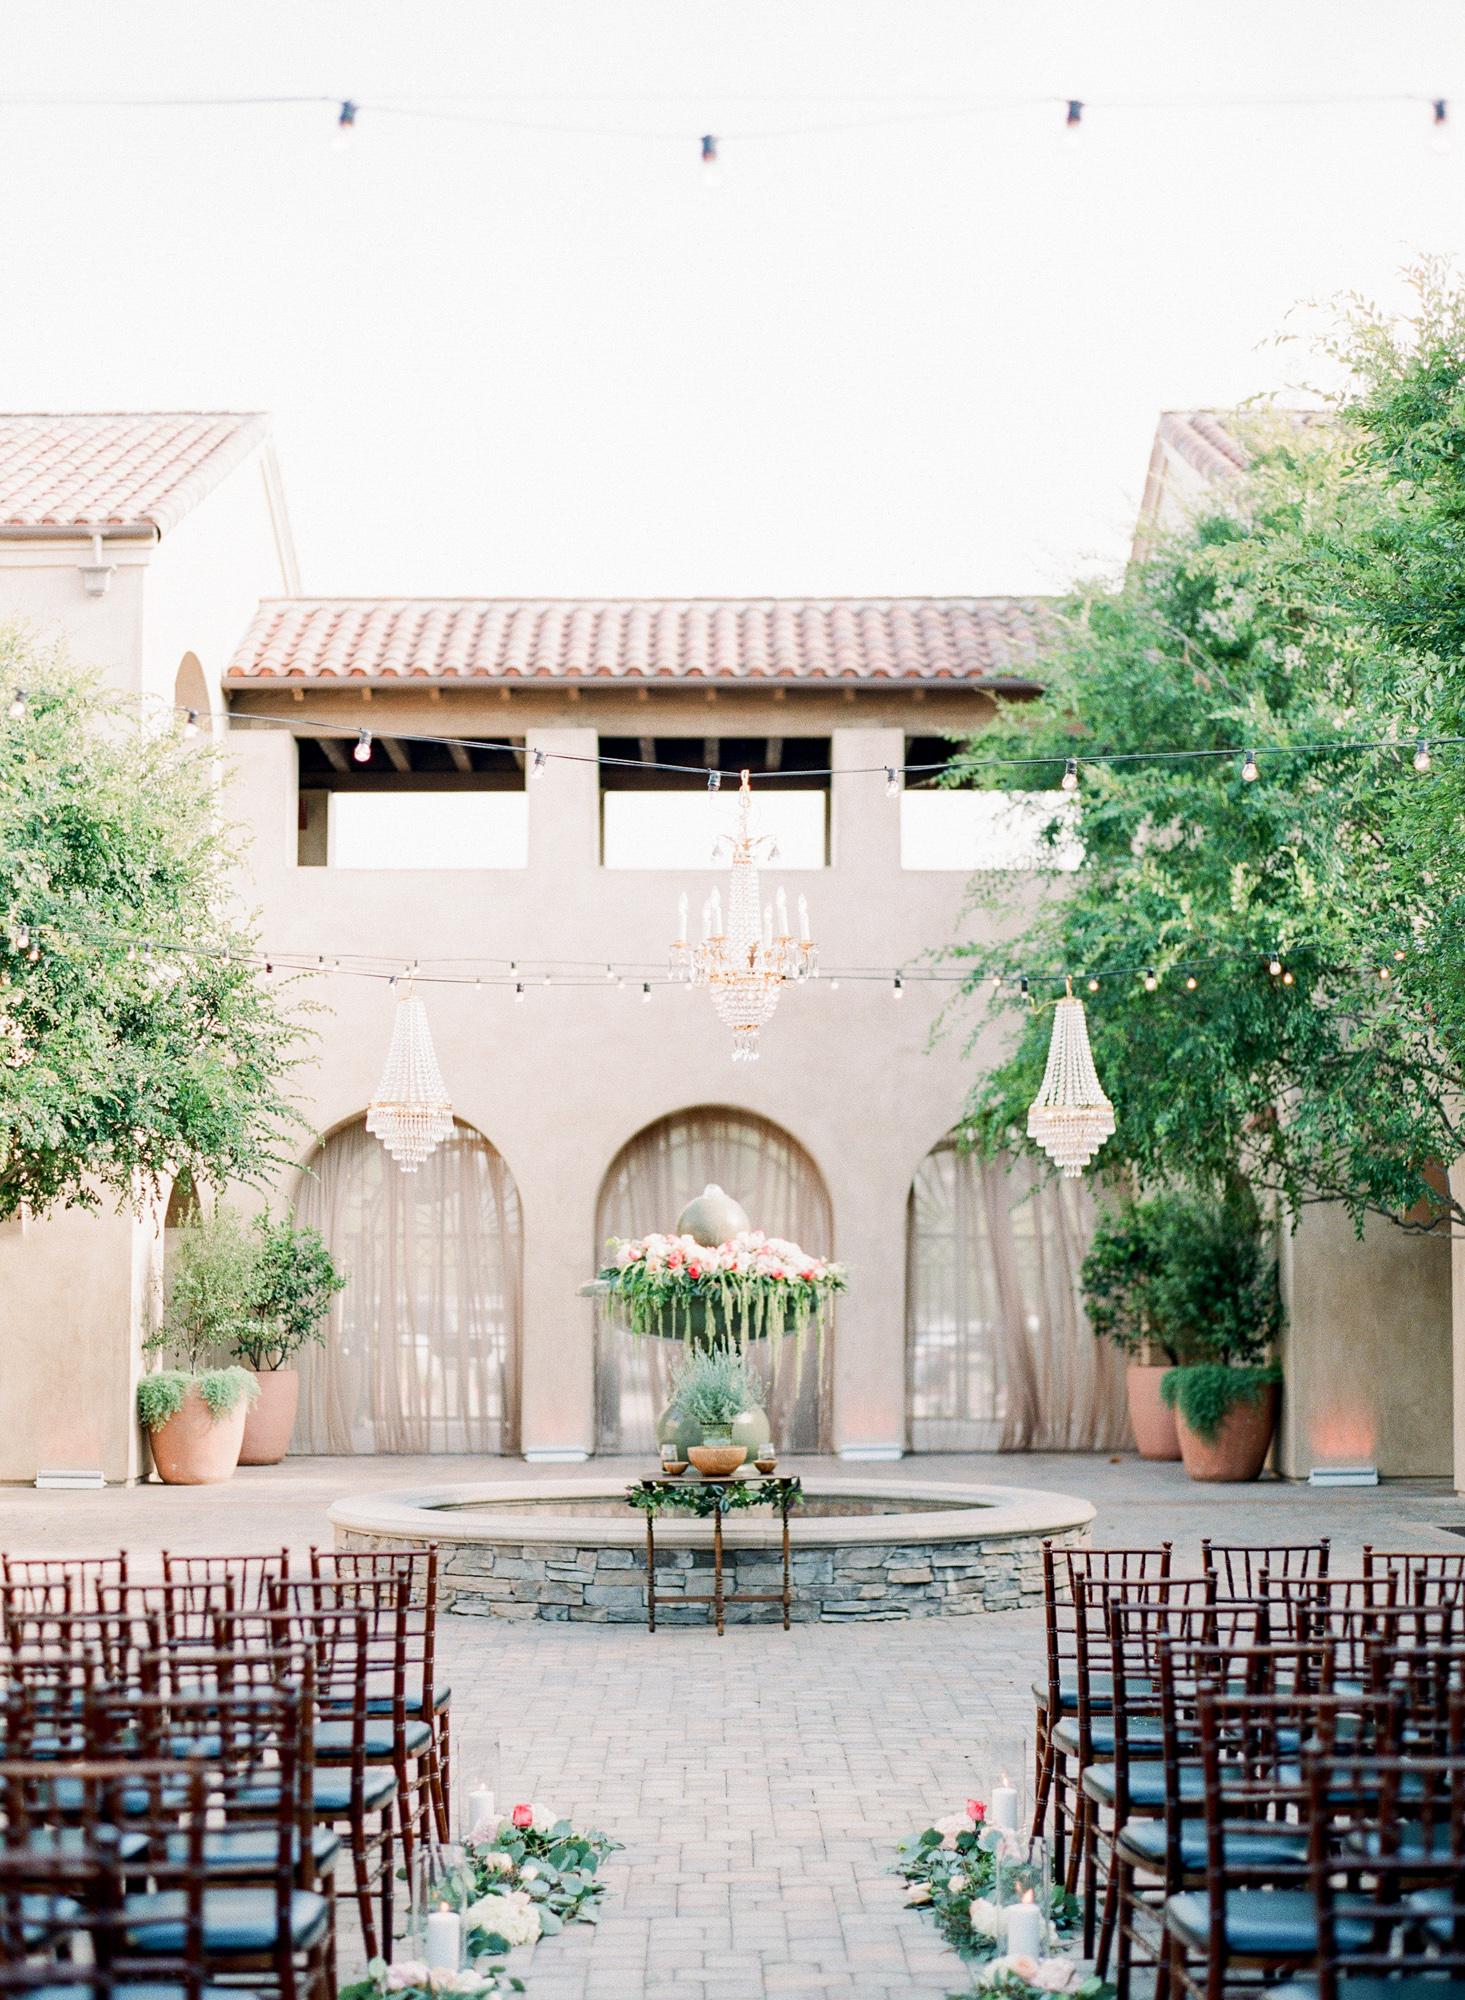 Serra-Plaza-Wedding-San-Juan-Capistrano-309.jpg